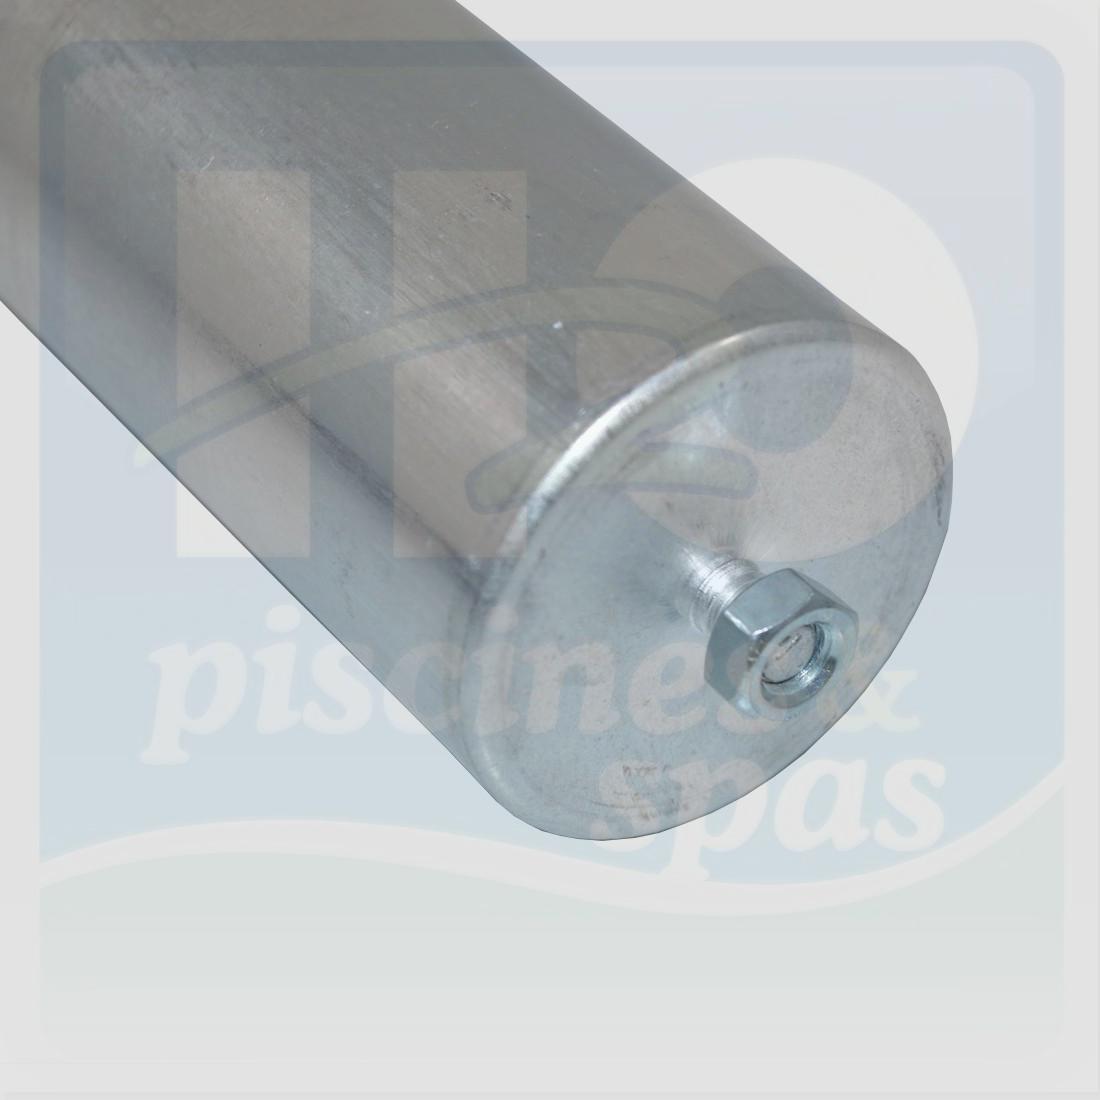 condensateur compresseur alu 50 f de pompe chaleur zodiac powerpac 1 2 3 jdpac 80 h2o. Black Bedroom Furniture Sets. Home Design Ideas